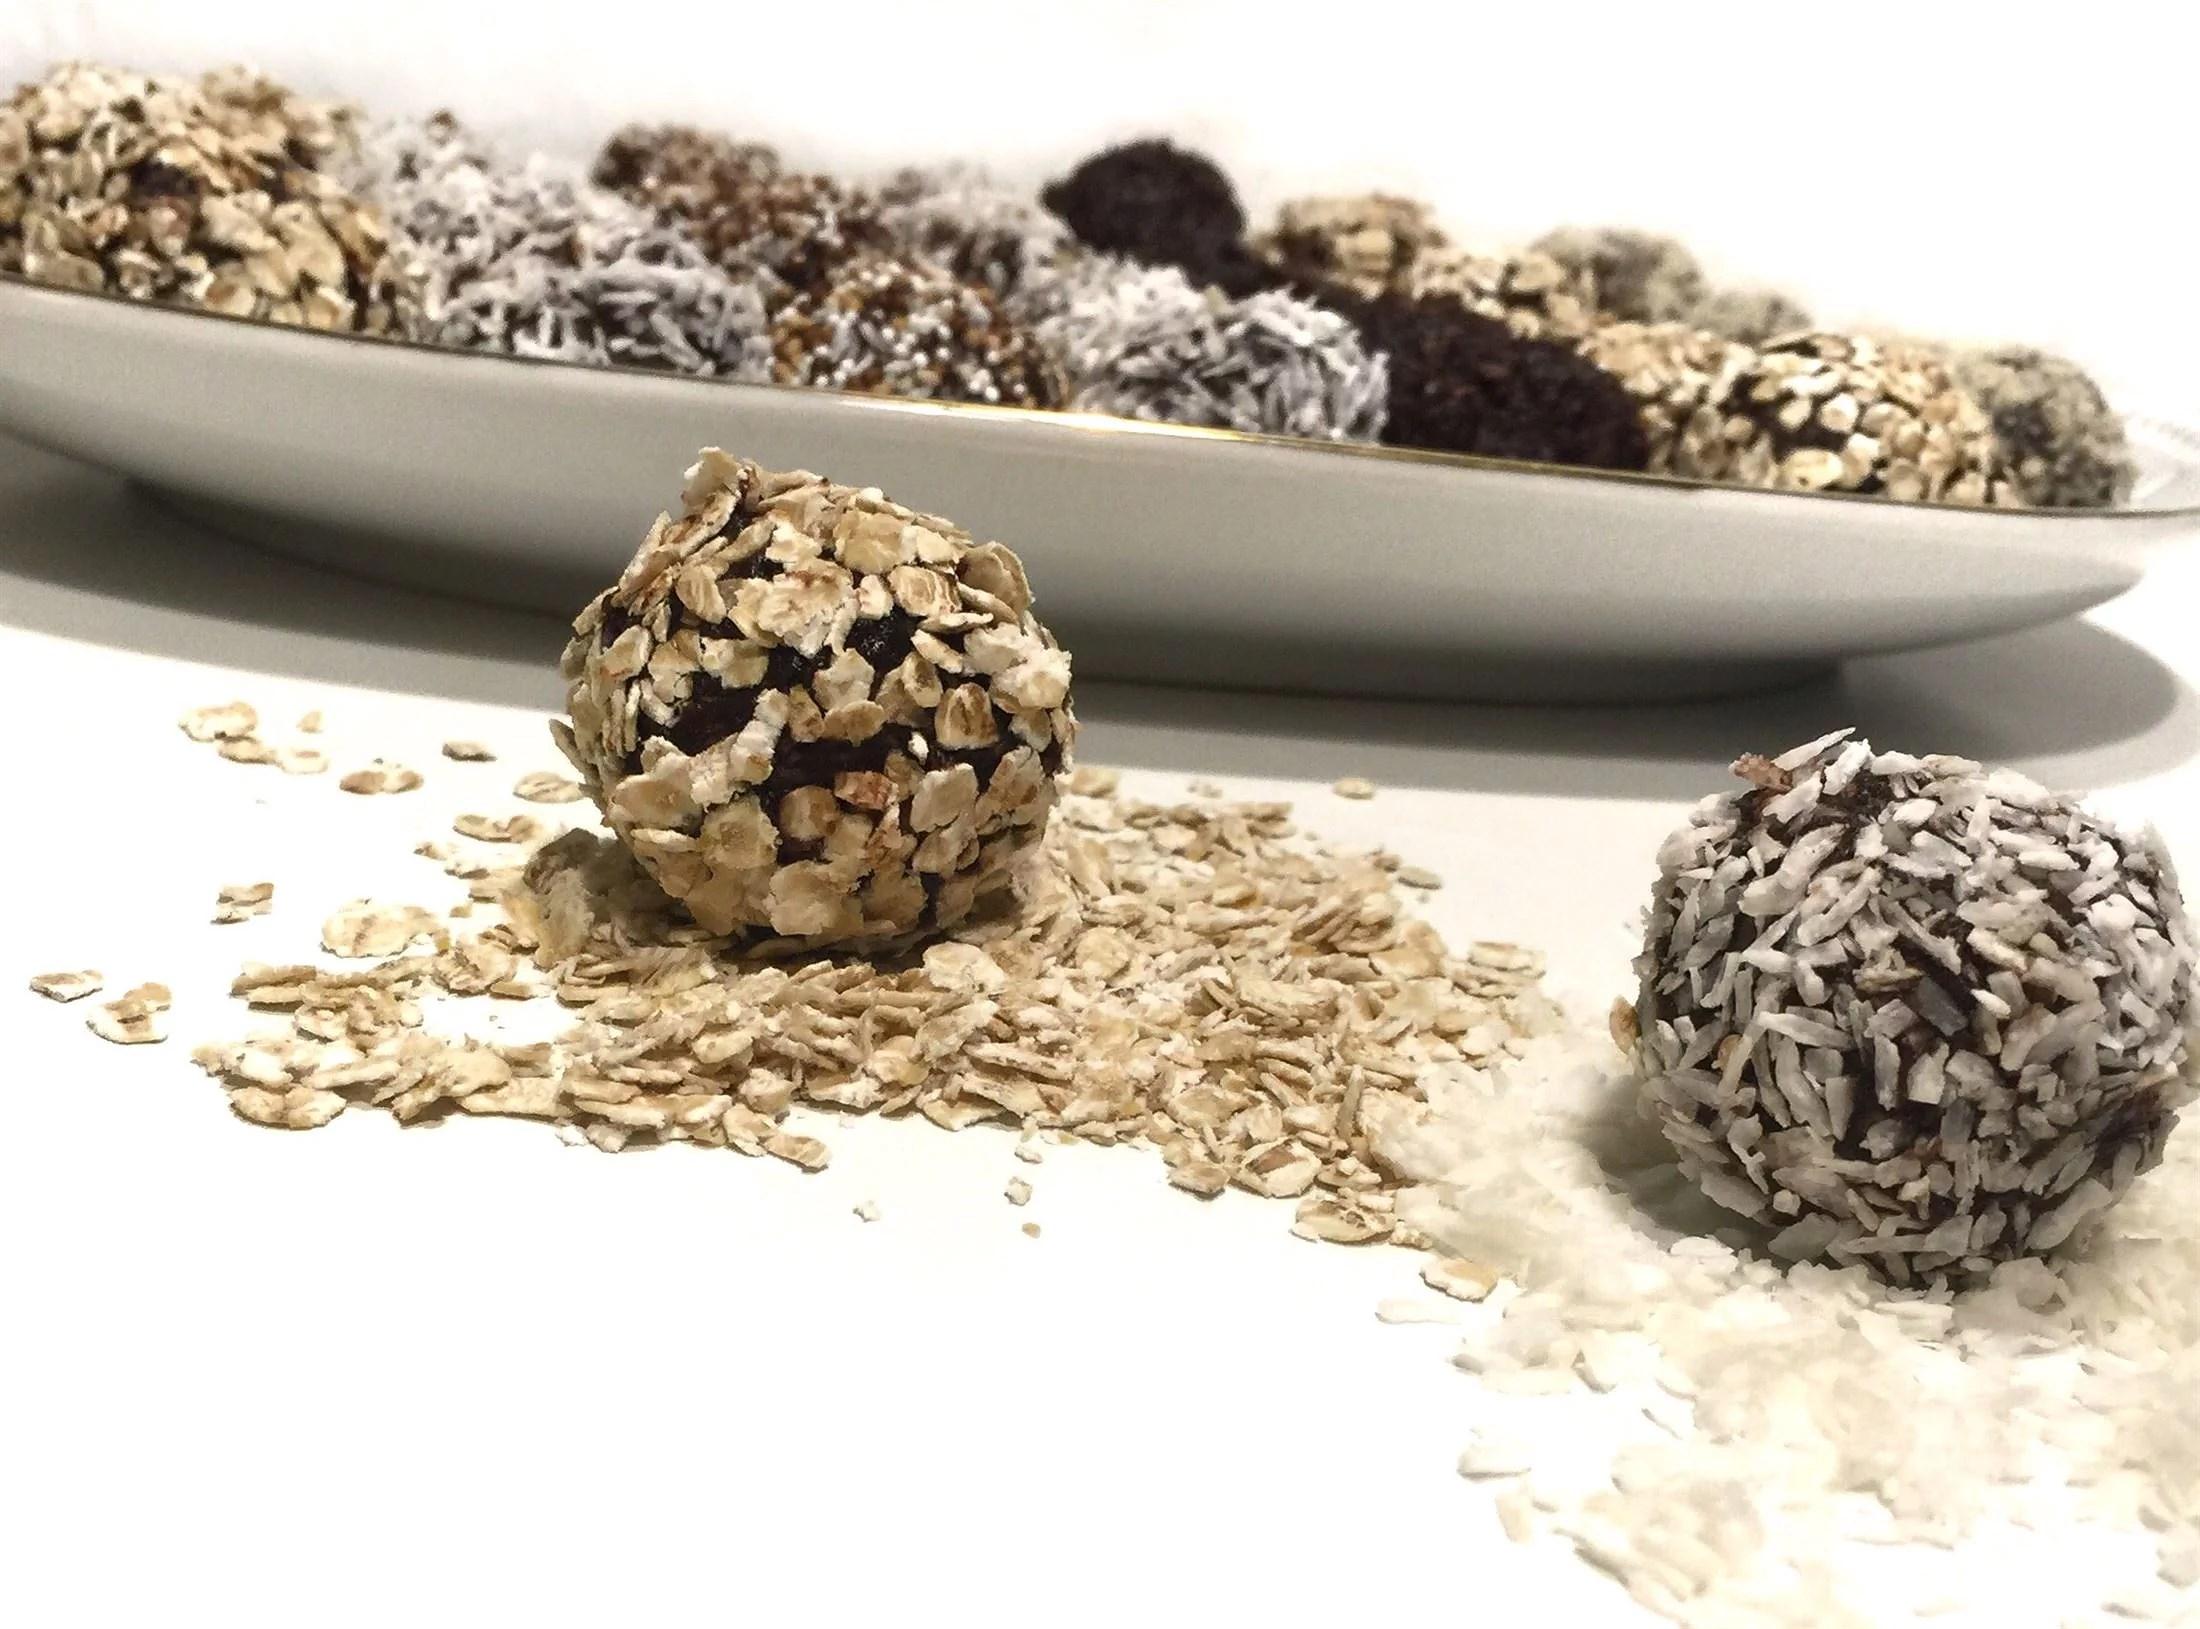 Snacks til fødselsdag i vuggestuen og opskriften på de lækre og sunde dadelkugler med kakao